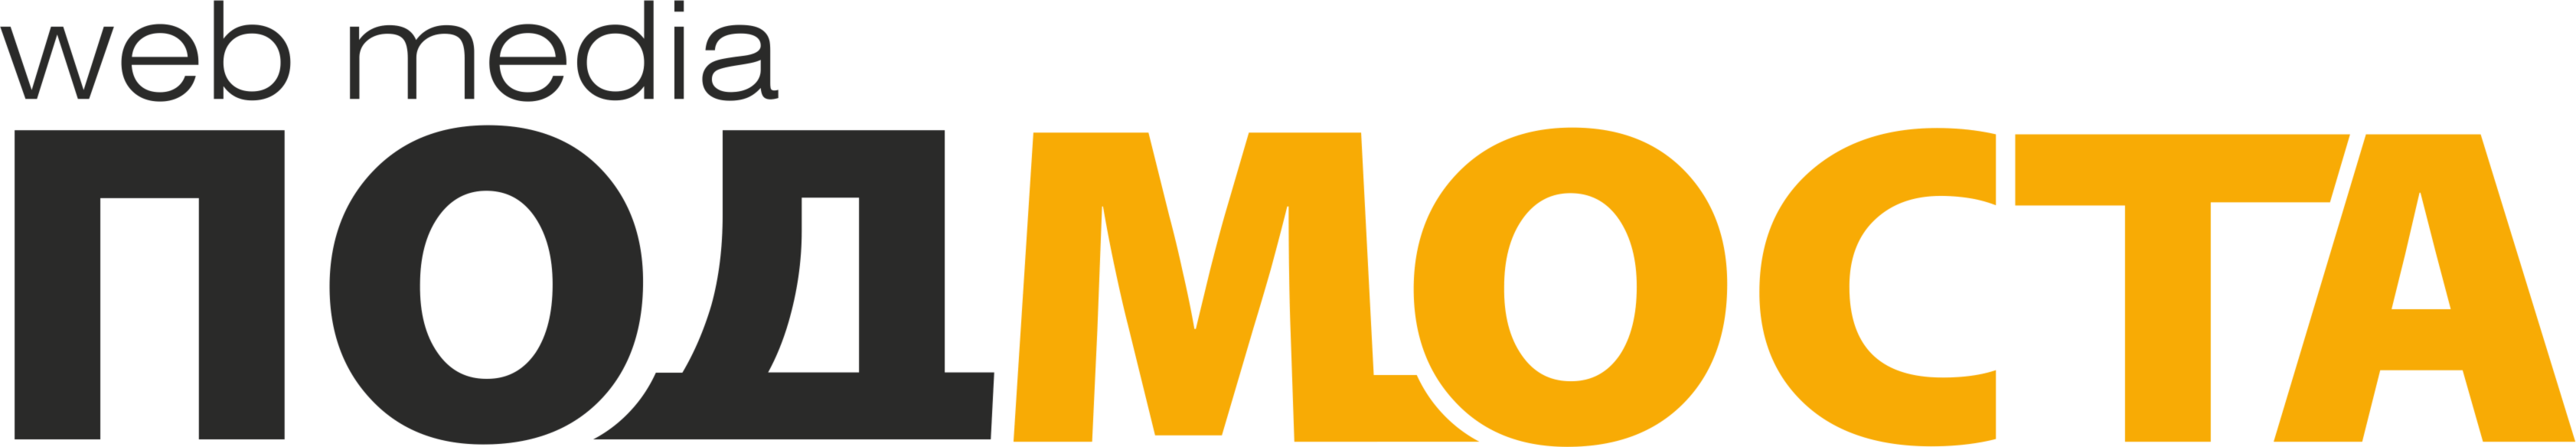 logo_pod_mosta_logo_only_type